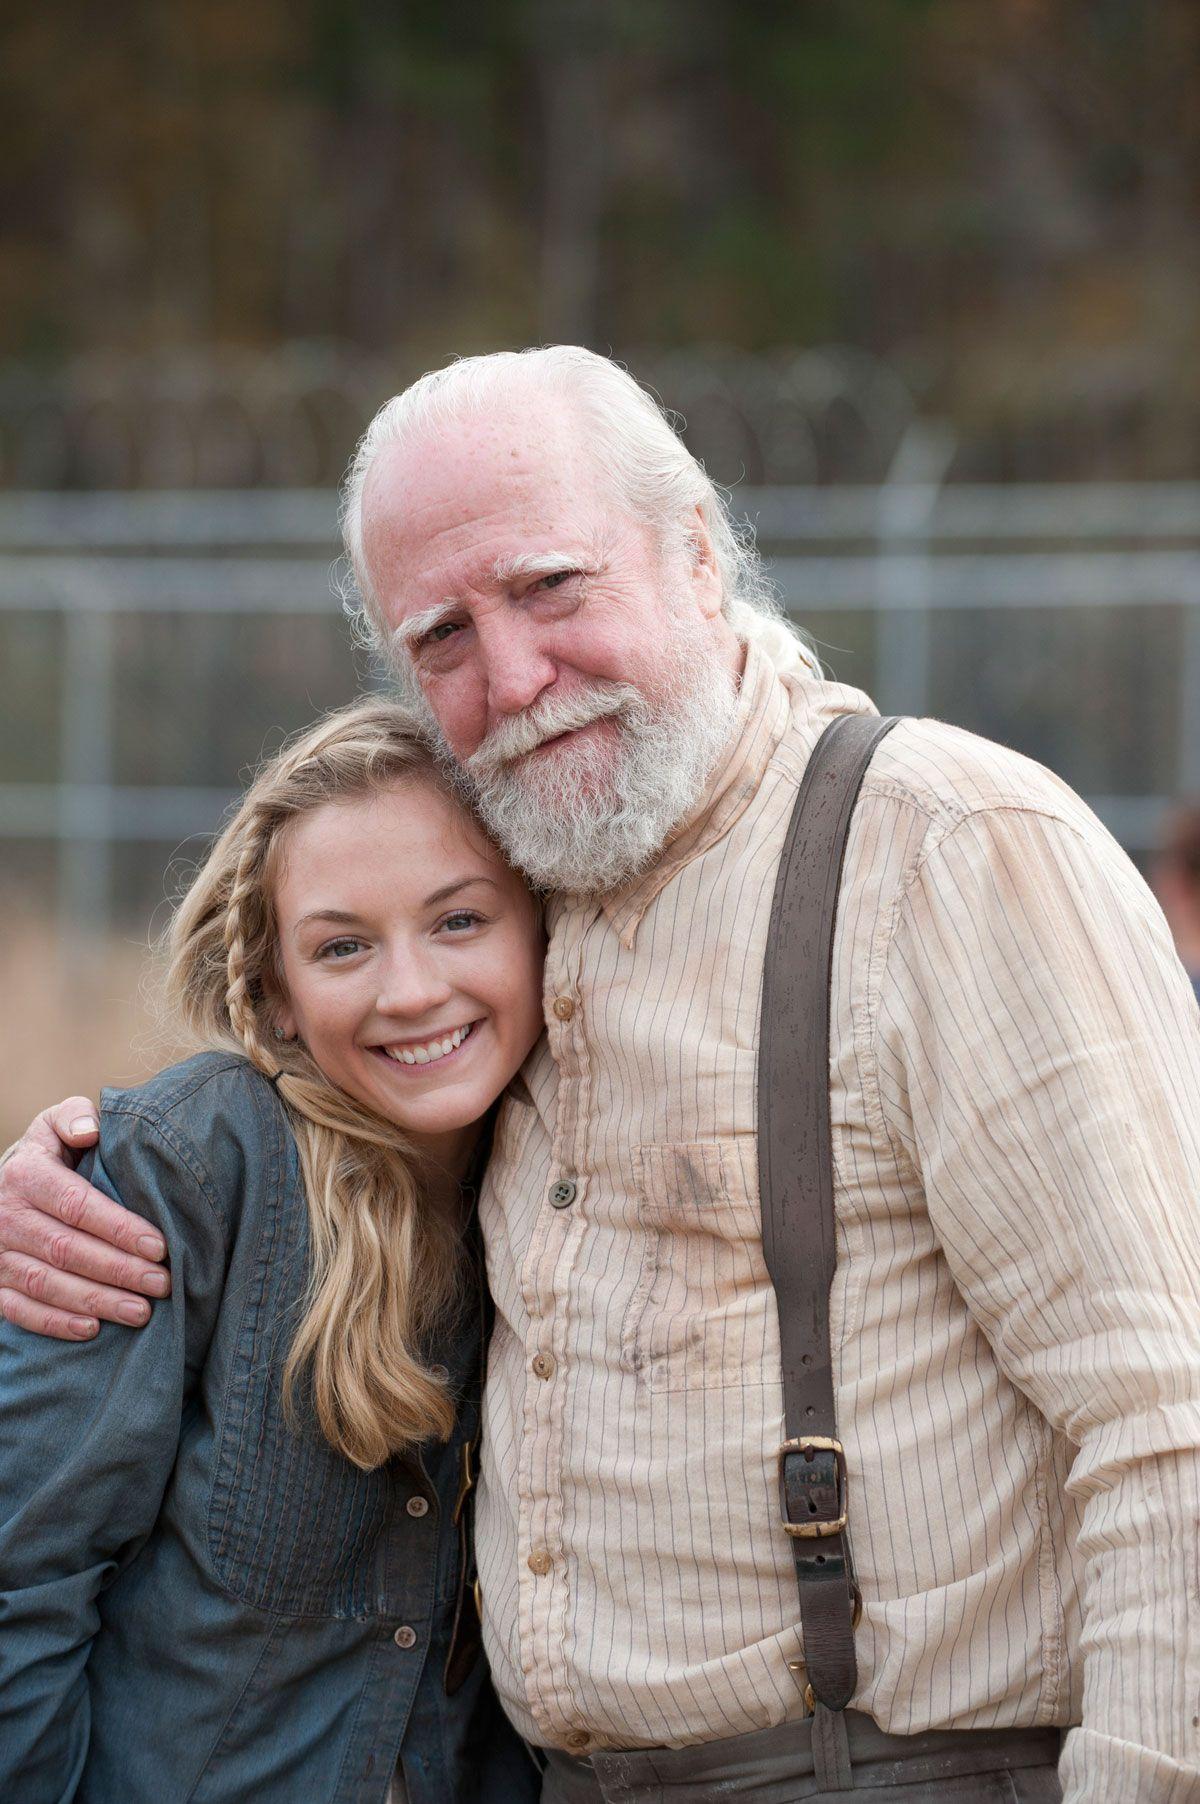 'Walking Dead' Selfies? Behind-The-Scenes Pics Show Silly Side Of Season Finale | MTV.com